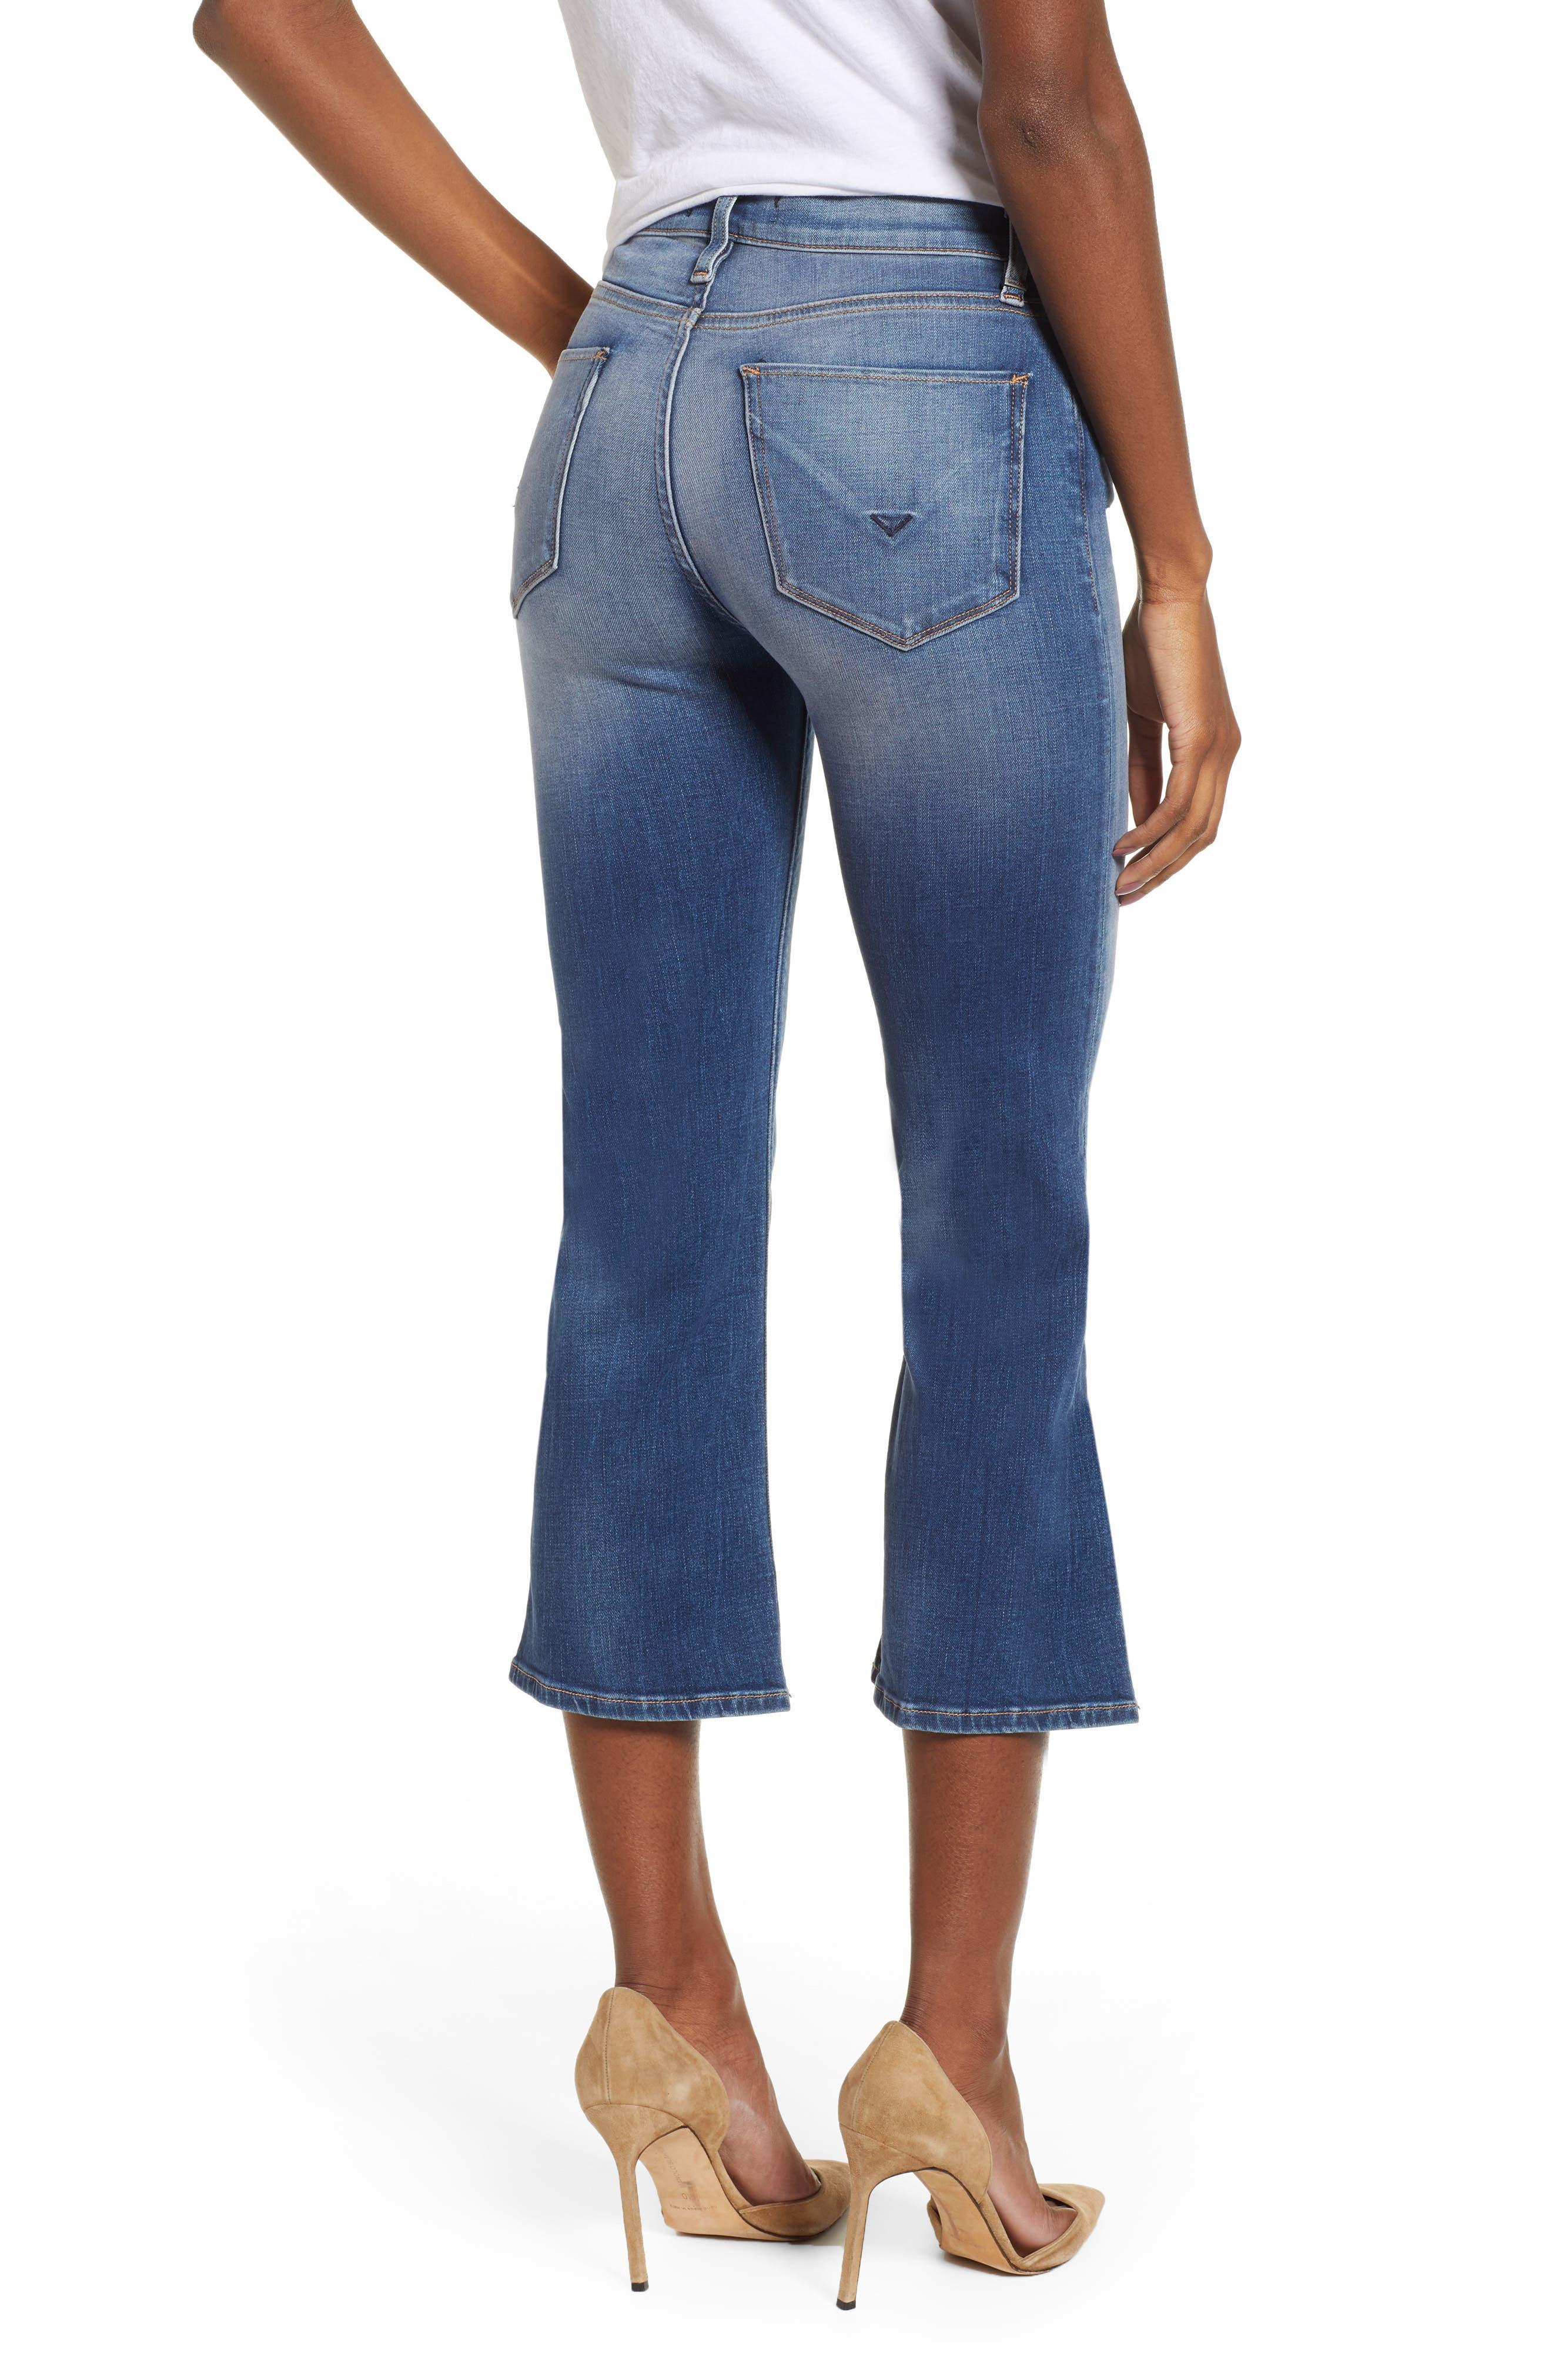 Hudson Jeans Womens Stella Midrise Crop 5 Pocket Jean